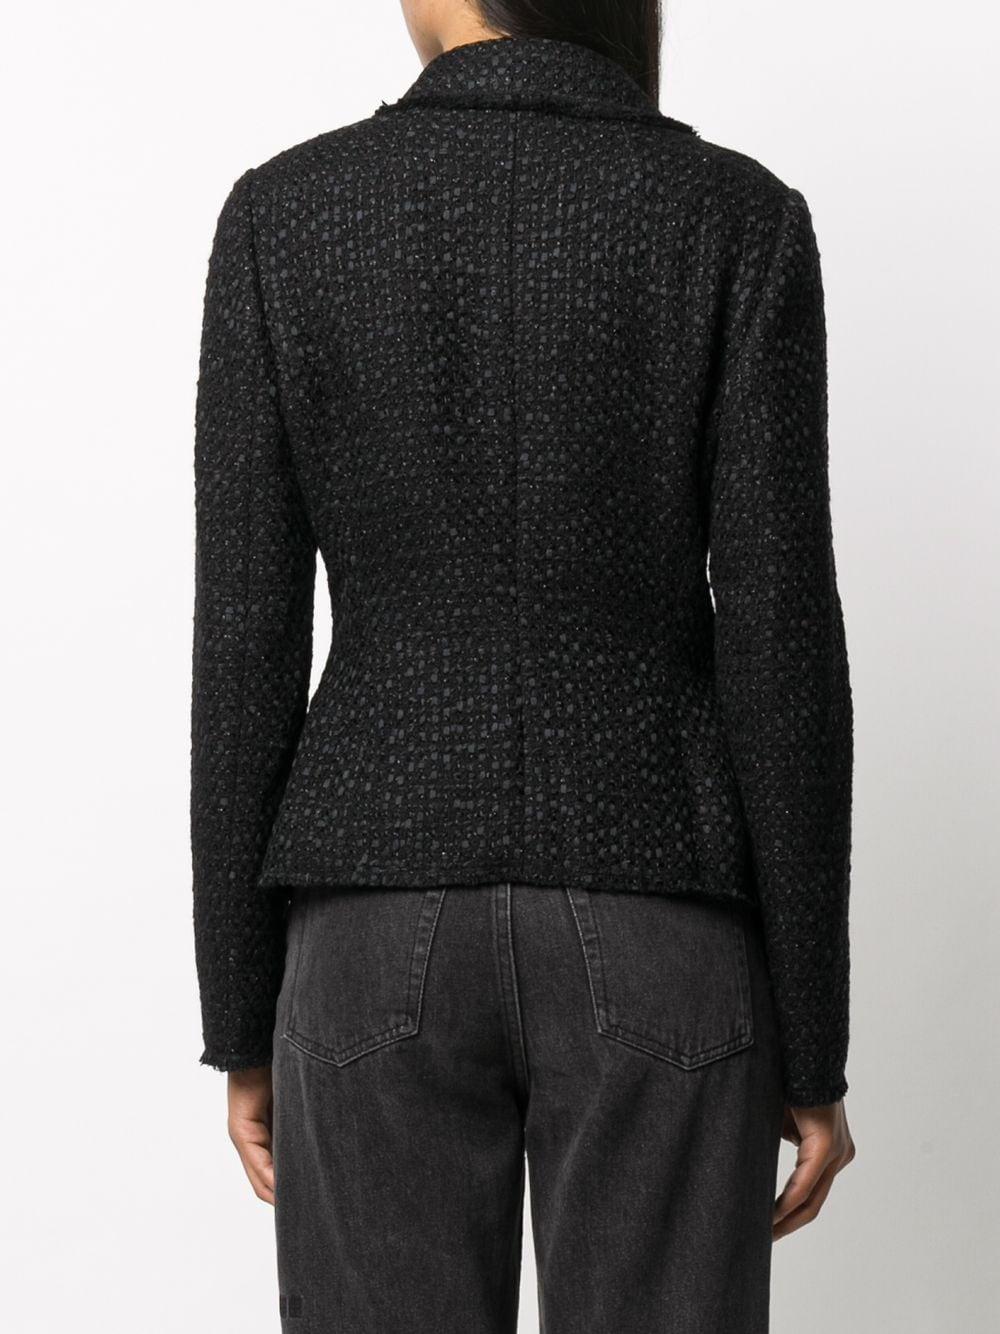 black cotton tweed jacket DOLCE & GABBANA      F26AOT-HUMJZN0000